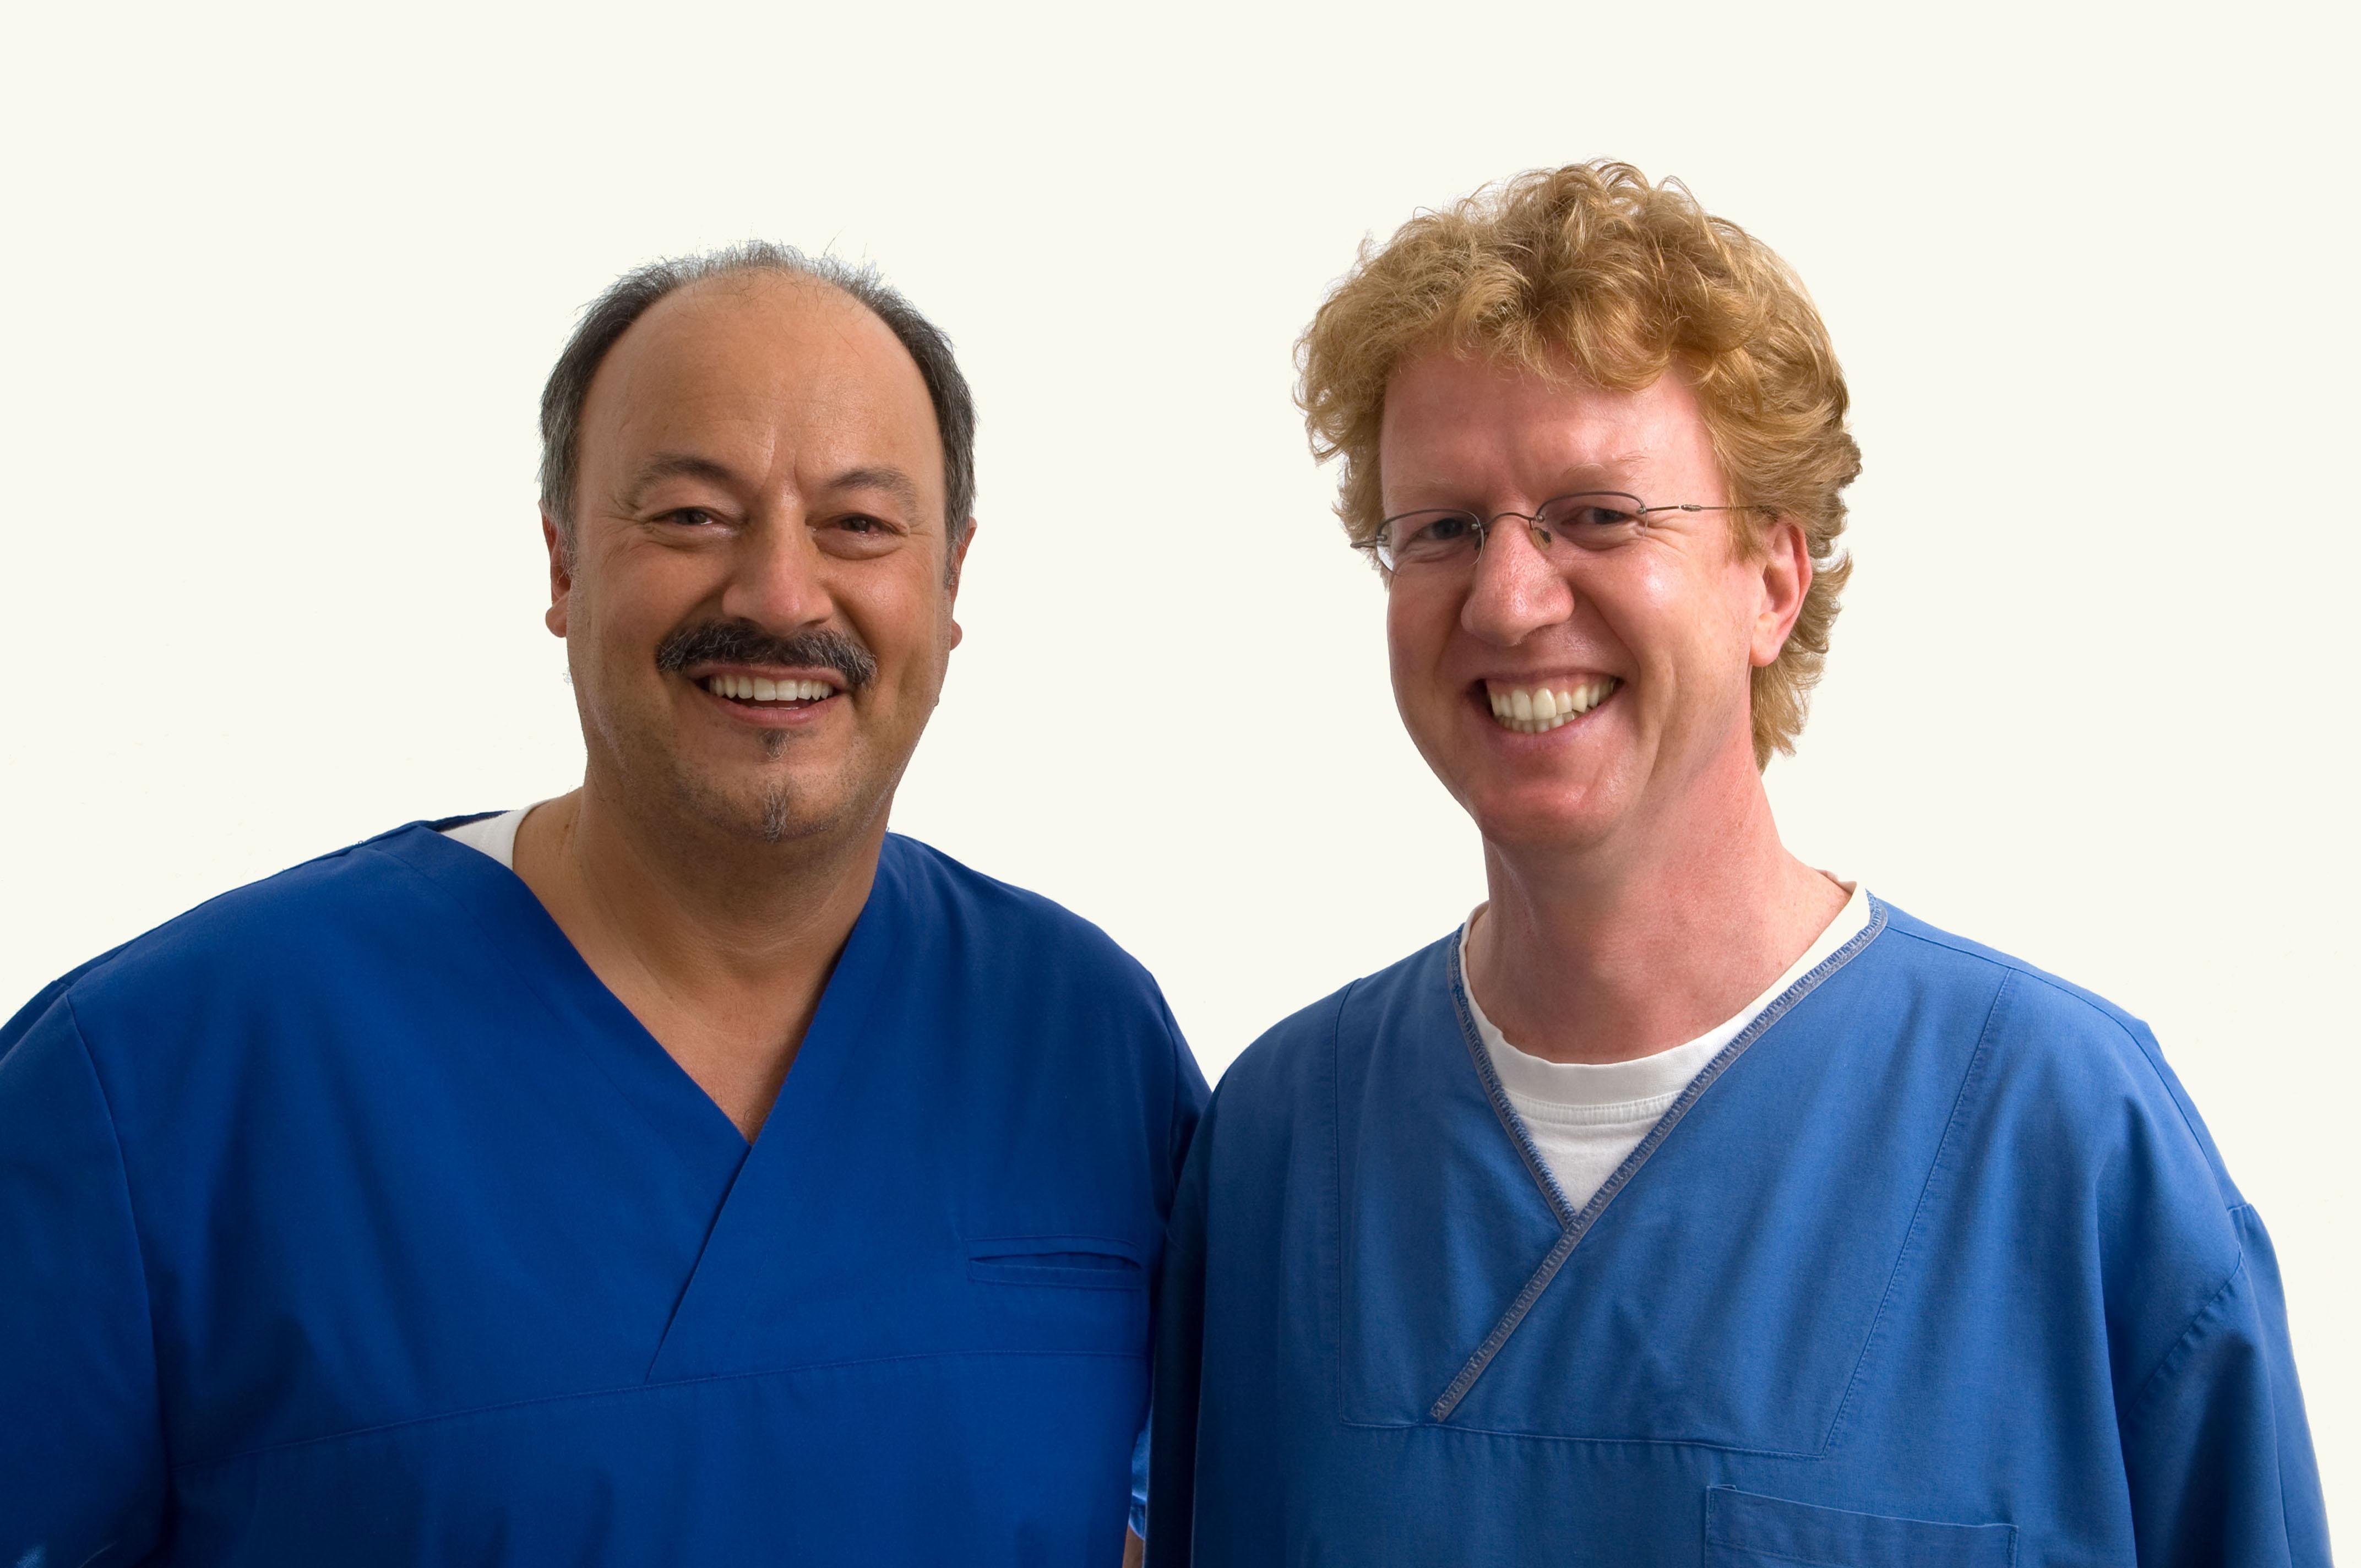 Zahnarzt Dr. Schlimbach und Anästhesist Dr. Jörg Liebing